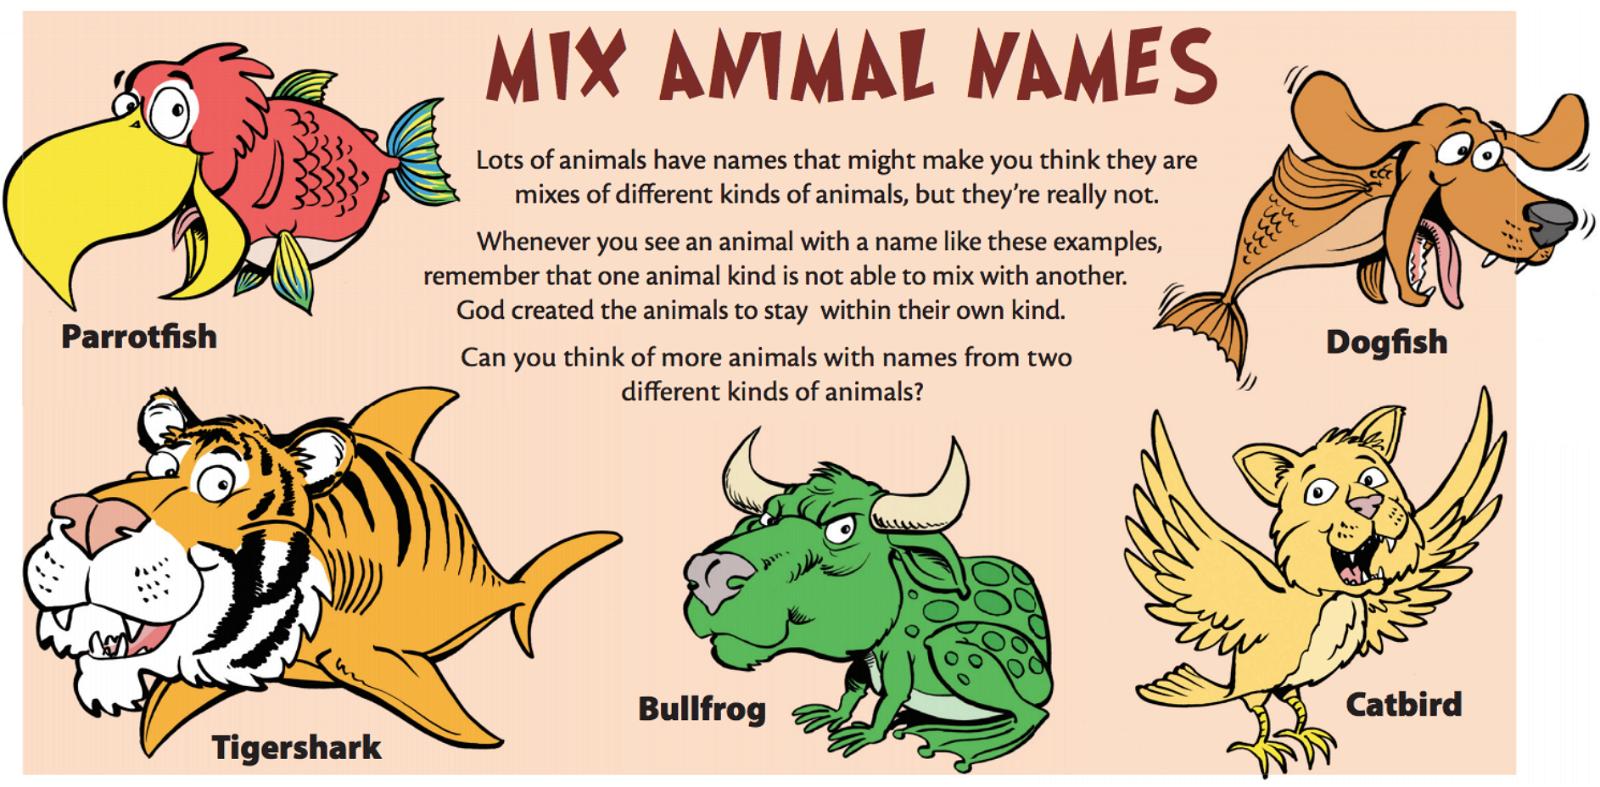 Mix animal names